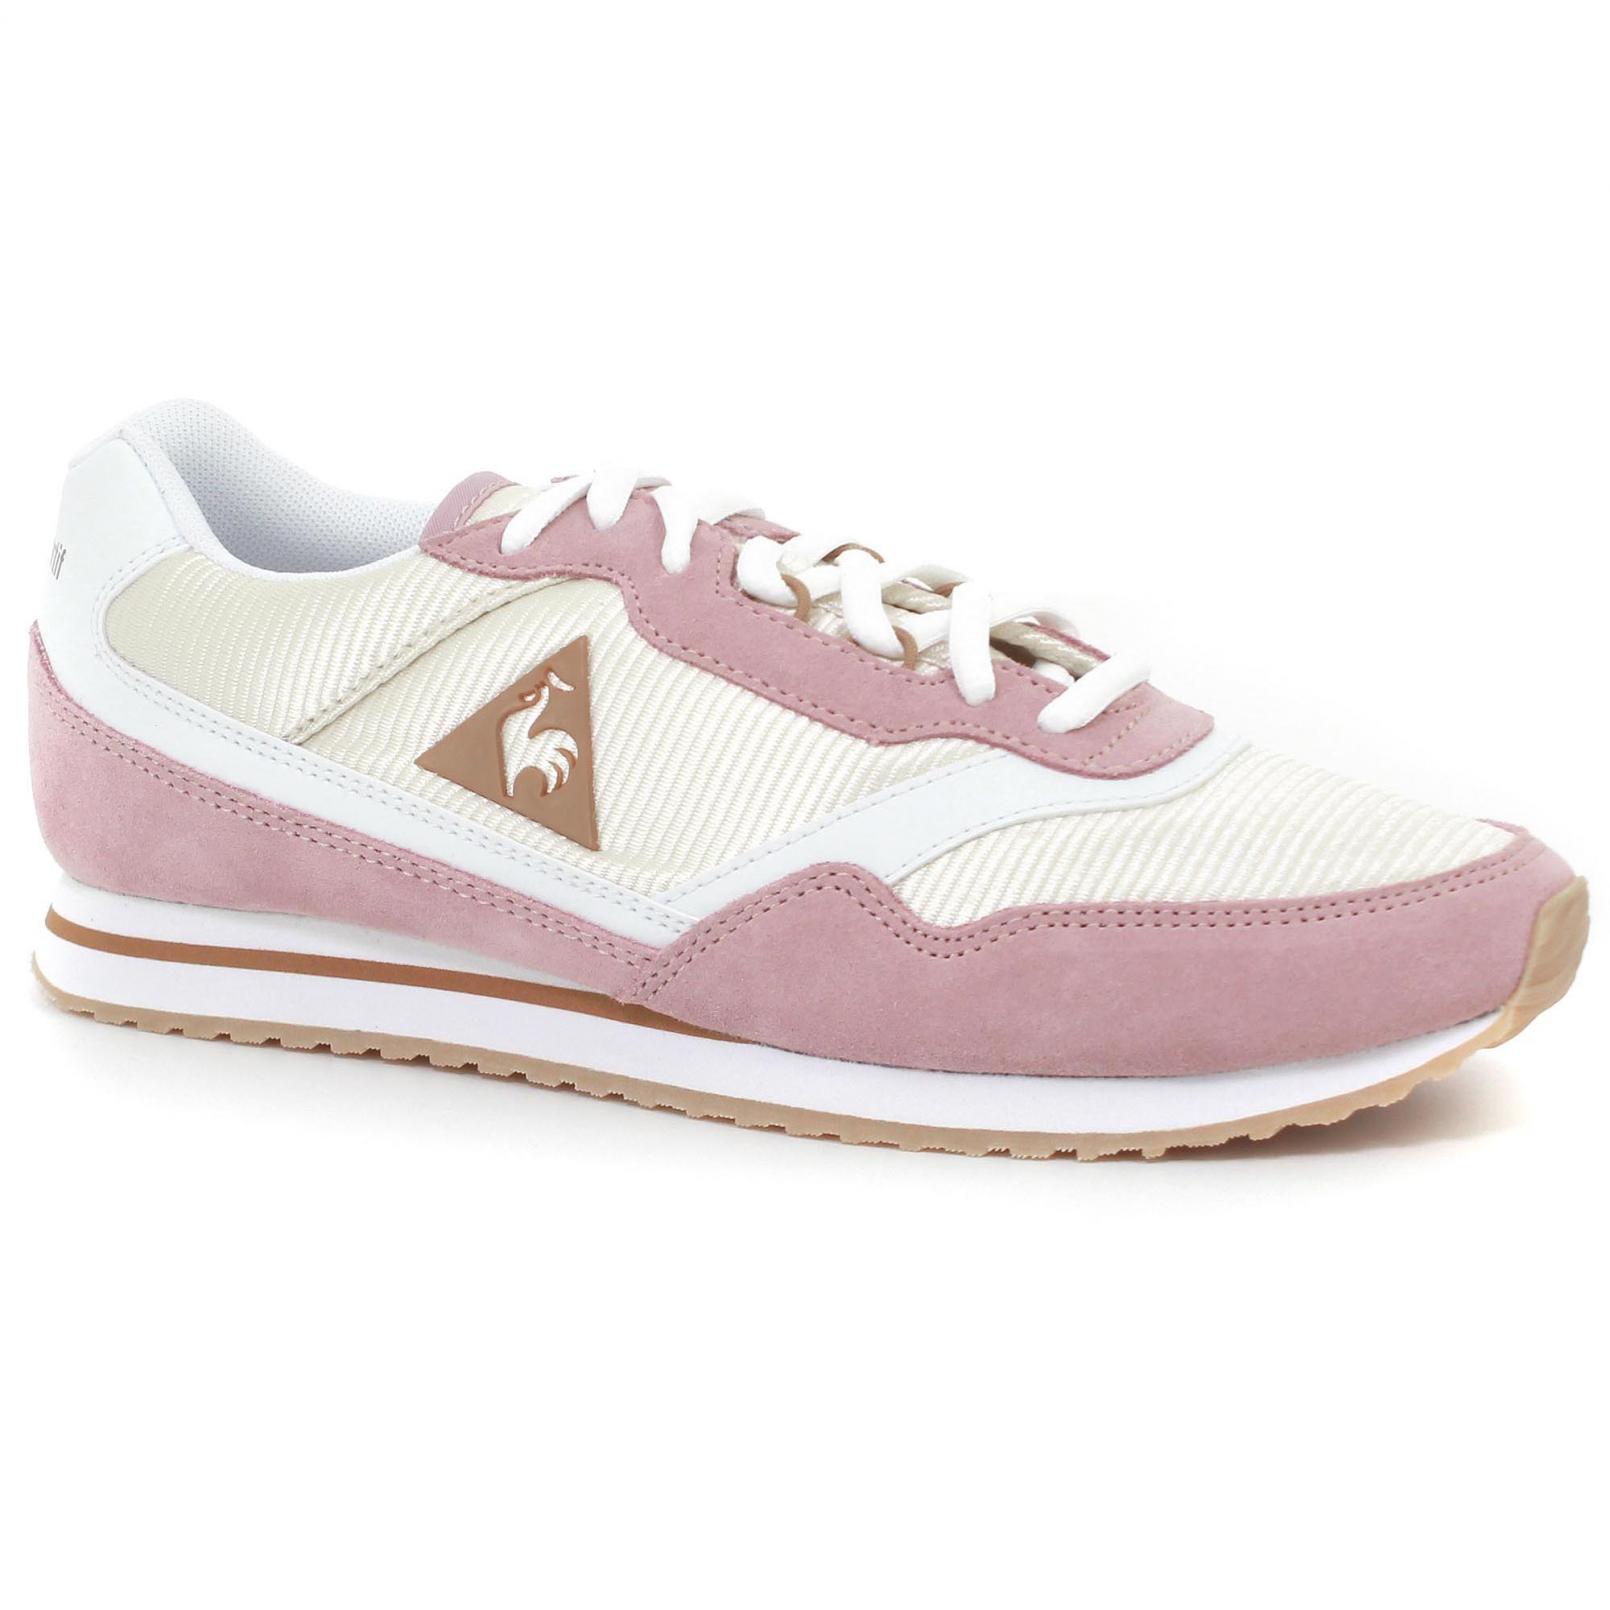 Shoes – Le Coq Sportif Louise Suede/Nylon Pink/Cream